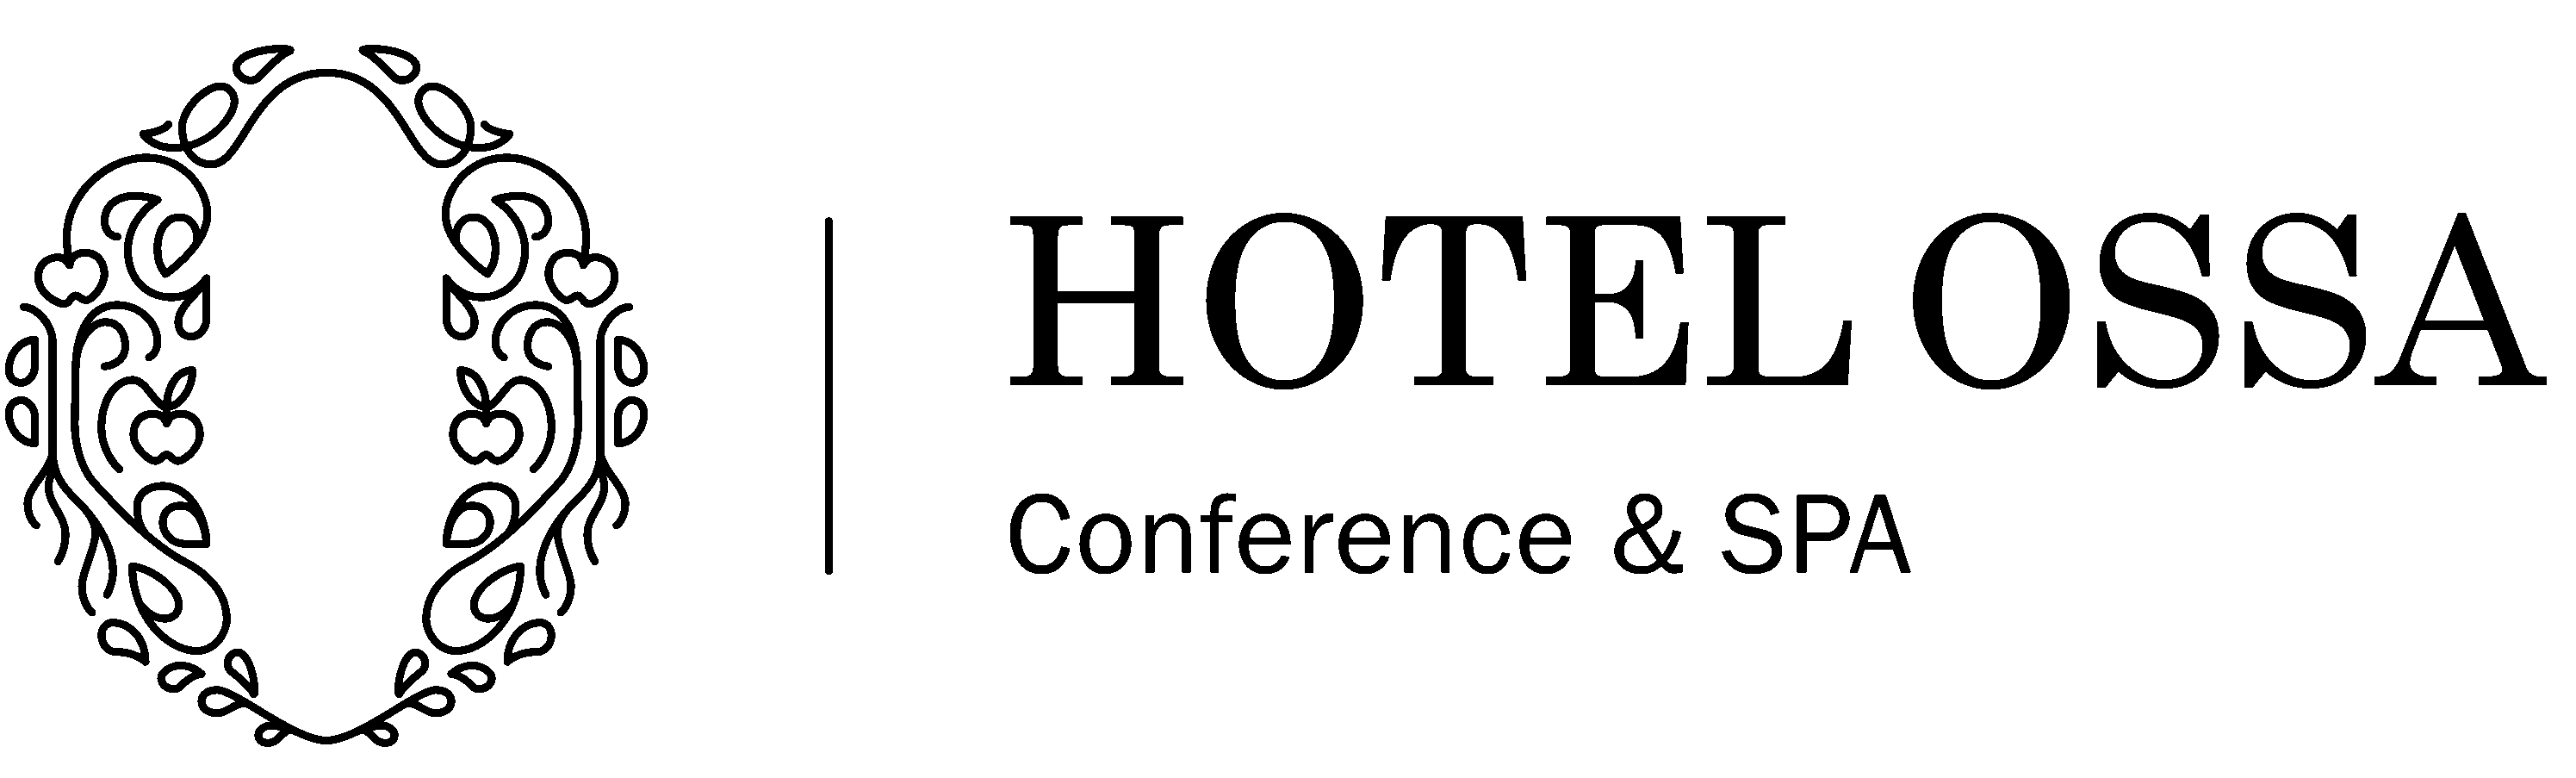 Infolinia Hotel Ossa   kontakt, telefon, numer, e-mail, adres